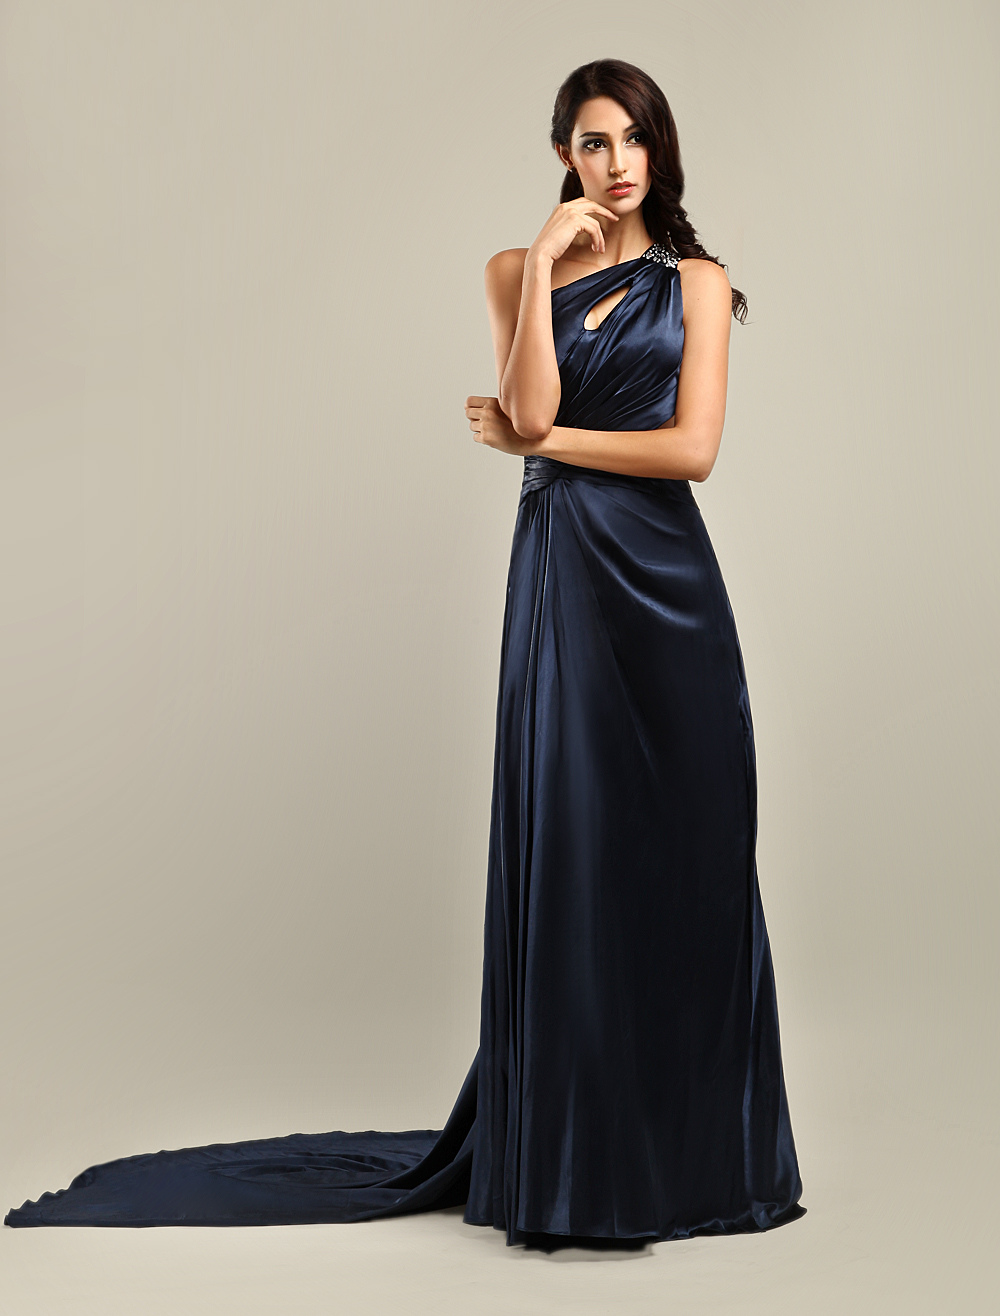 Elegant Black One-Shoulder Cut Out Satin Prom Dress (Wedding Prom Dresses) photo